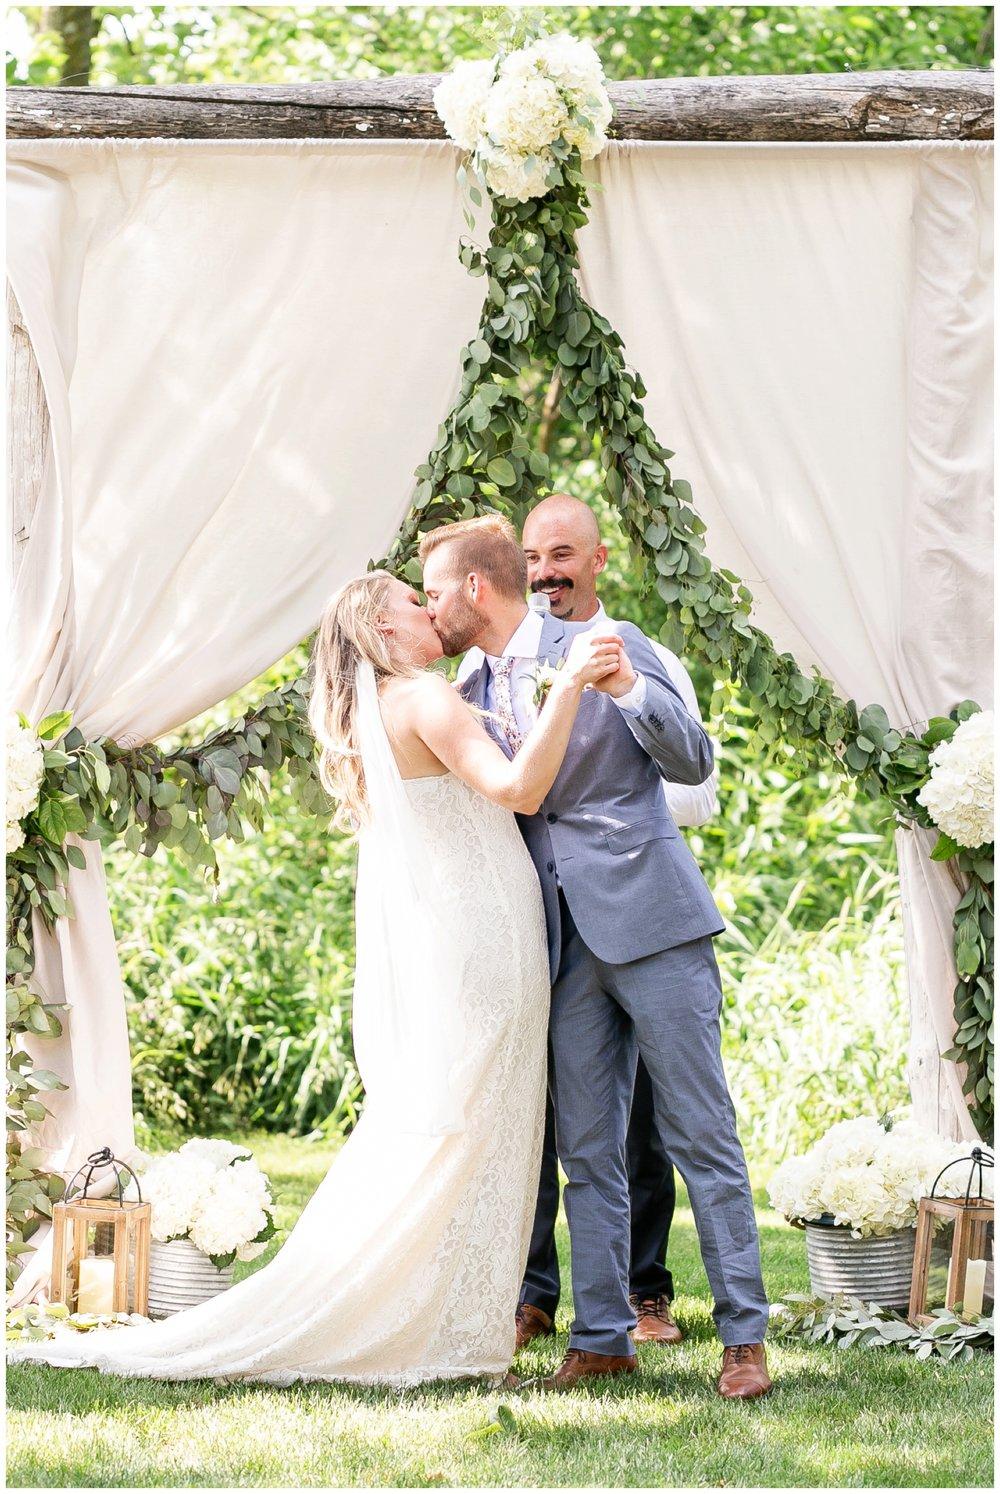 the_cupola_barn_wedding_delafield_resort_oconomowoc_wisconsin_0391.jpg